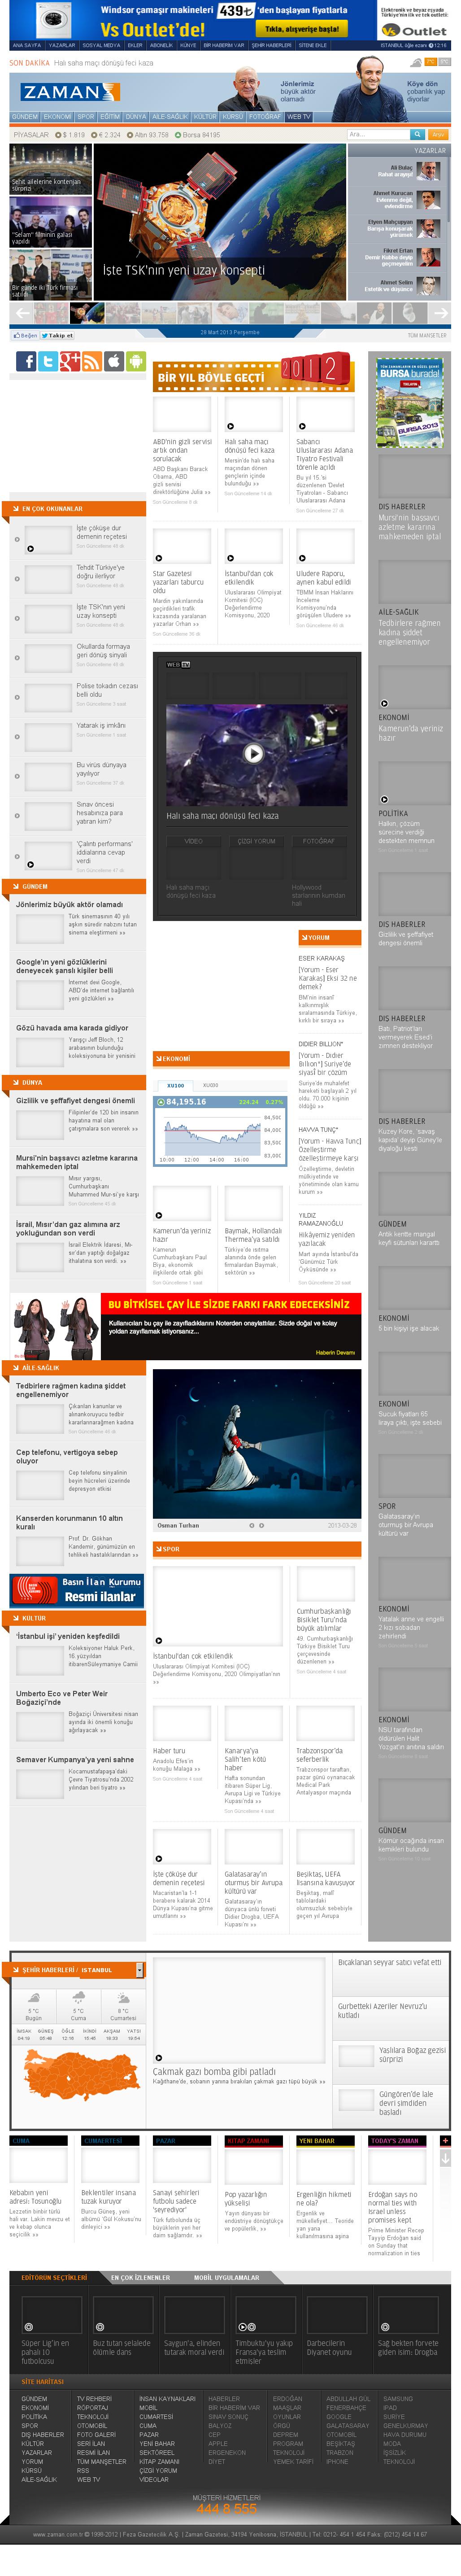 Zaman Online at Thursday March 28, 2013, 4:26 a.m. UTC